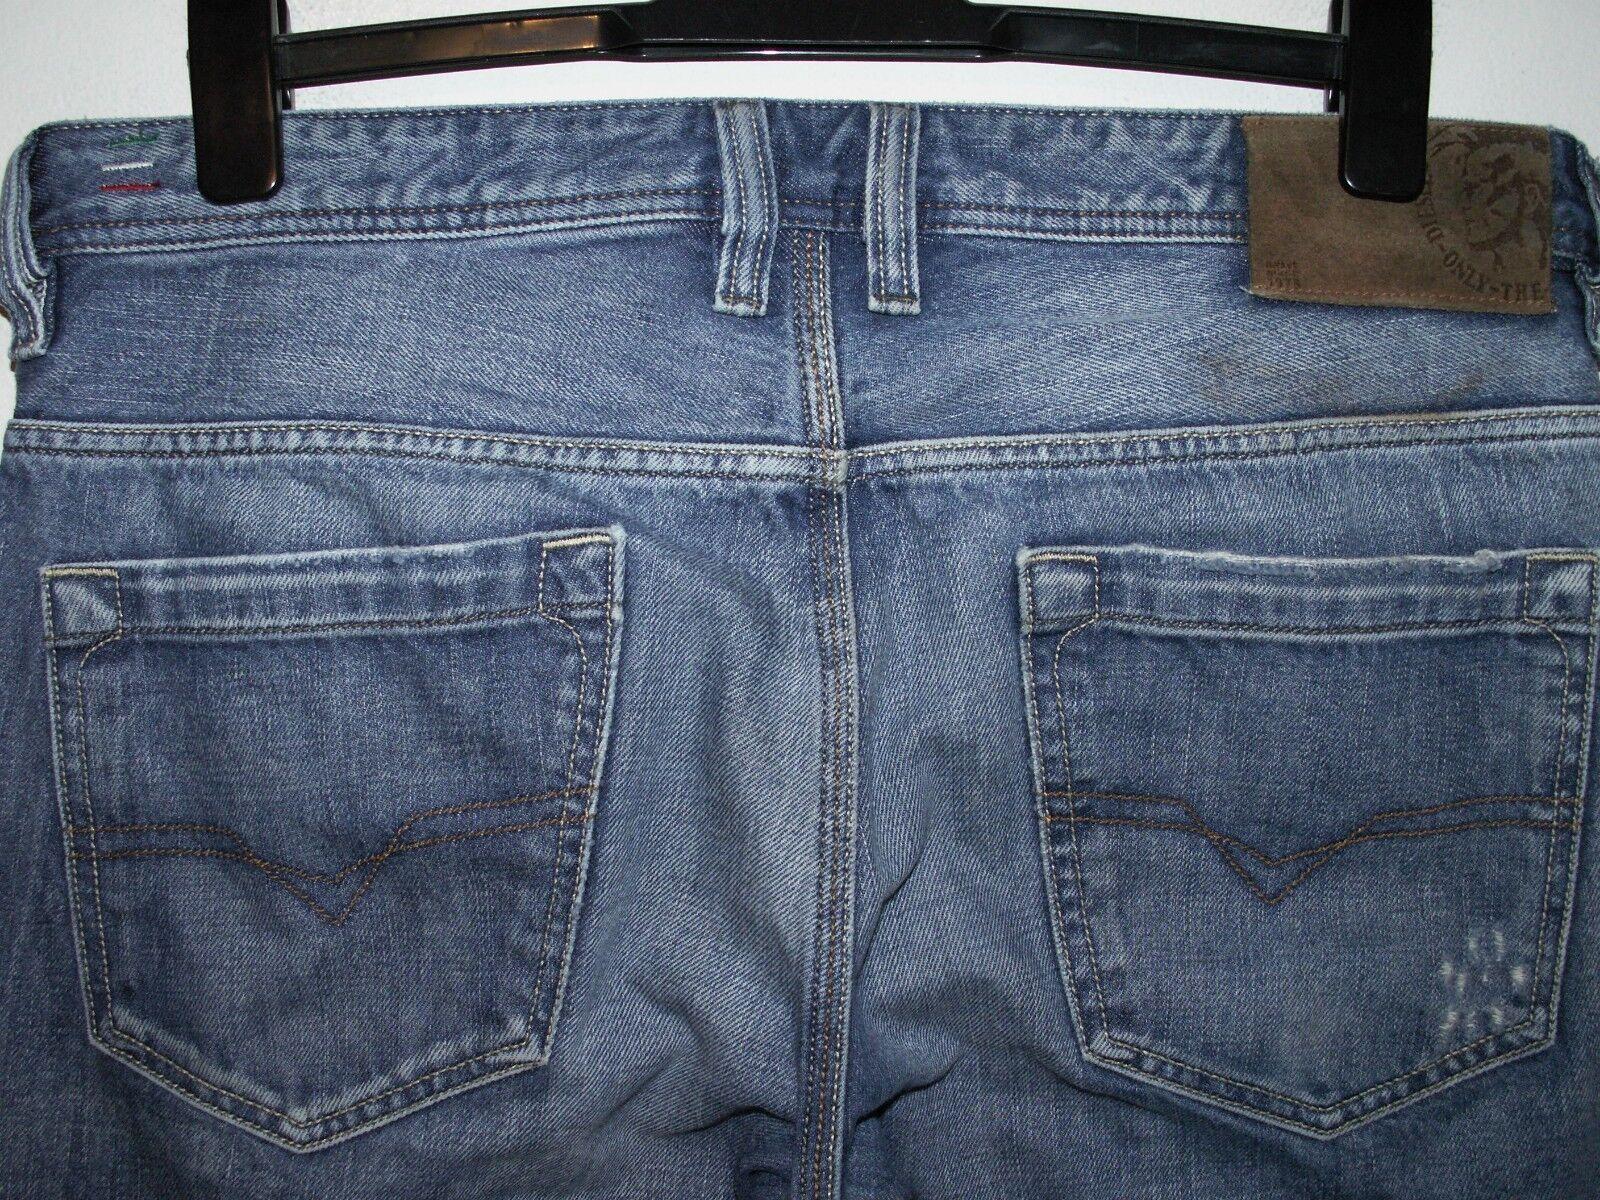 Diesel koffha bootcut jeans wash 0070Z W34 L34 (a3678)